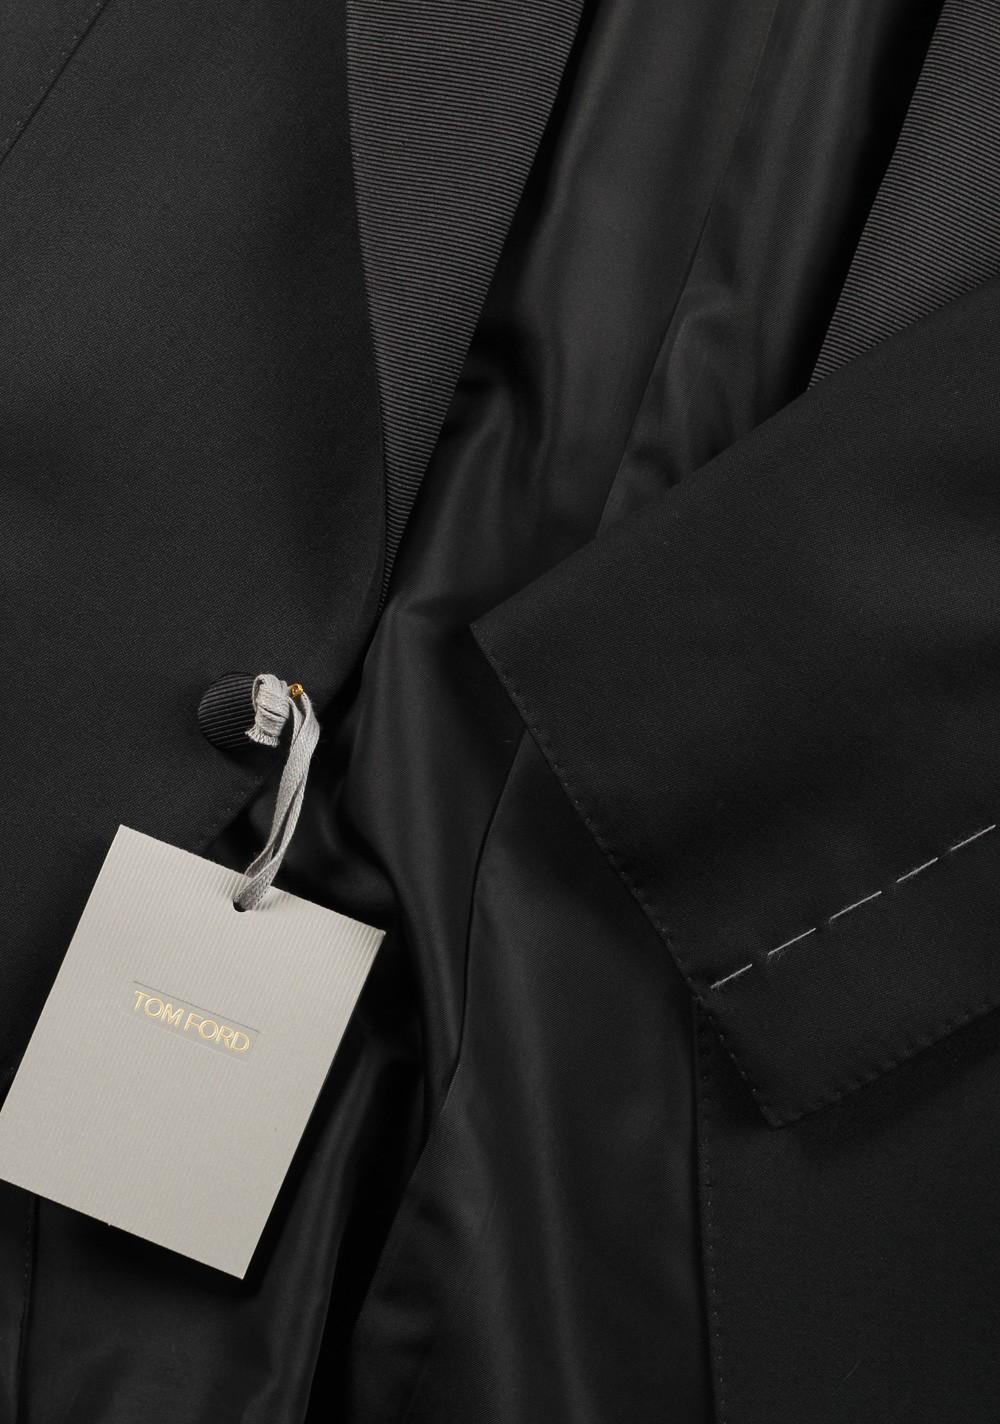 TOM FORD Windsor Black Tuxedo Suit Smoking Size 48C / 38S U.S. Fit A | Costume Limité